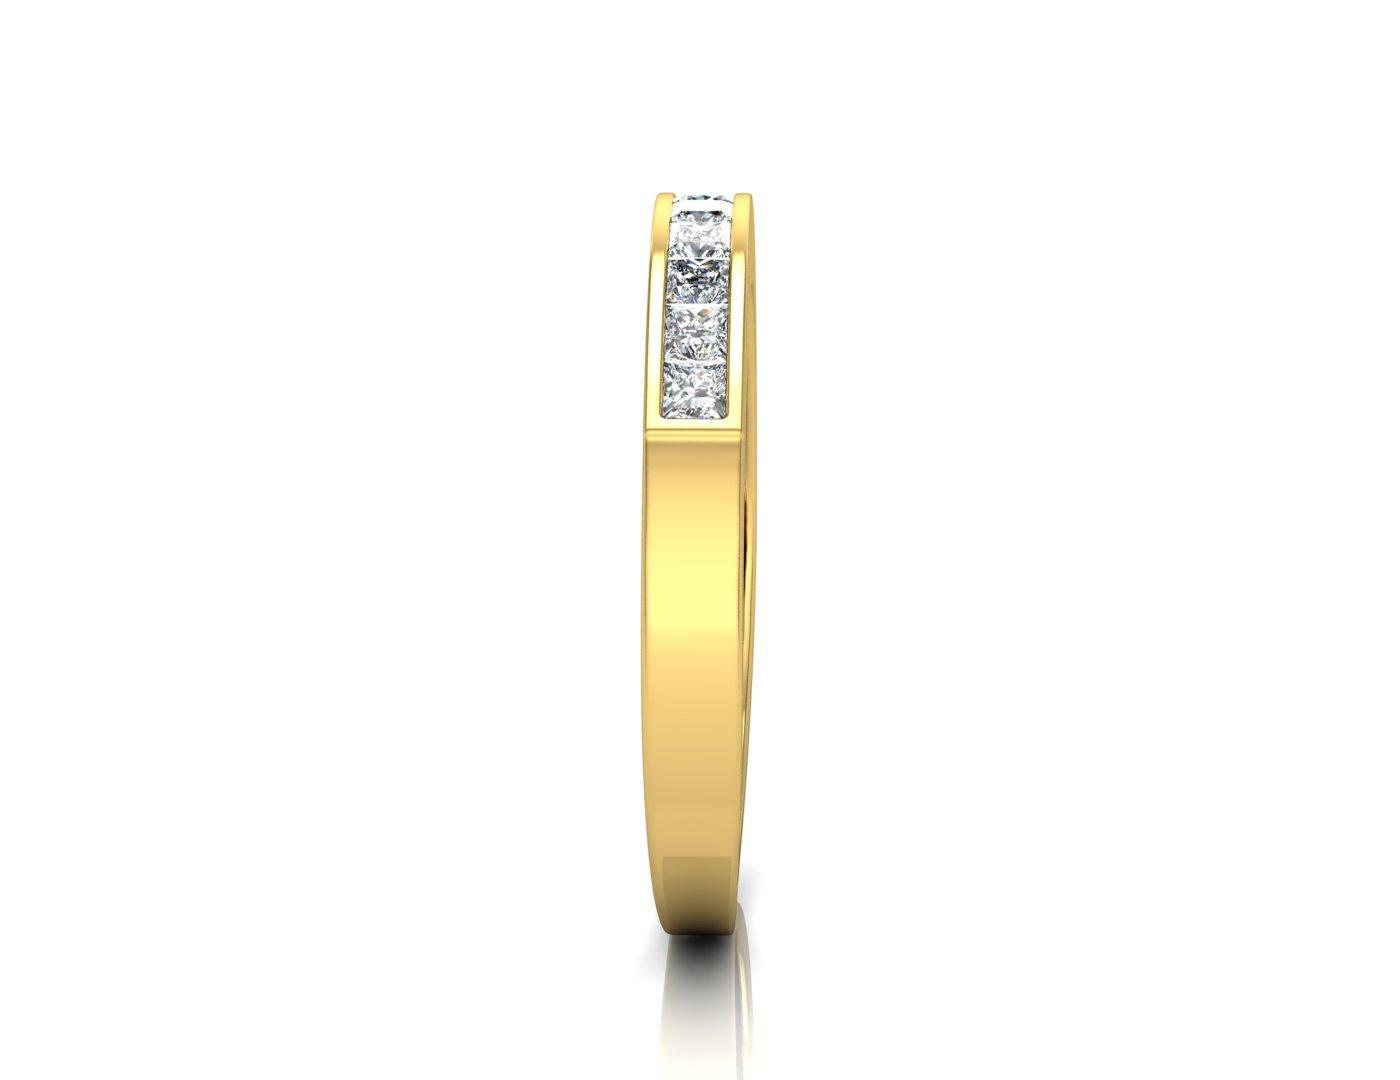 9ct Channel Set Semi Eternity Diamond Ring 0.50 Carats - Image 2 of 4